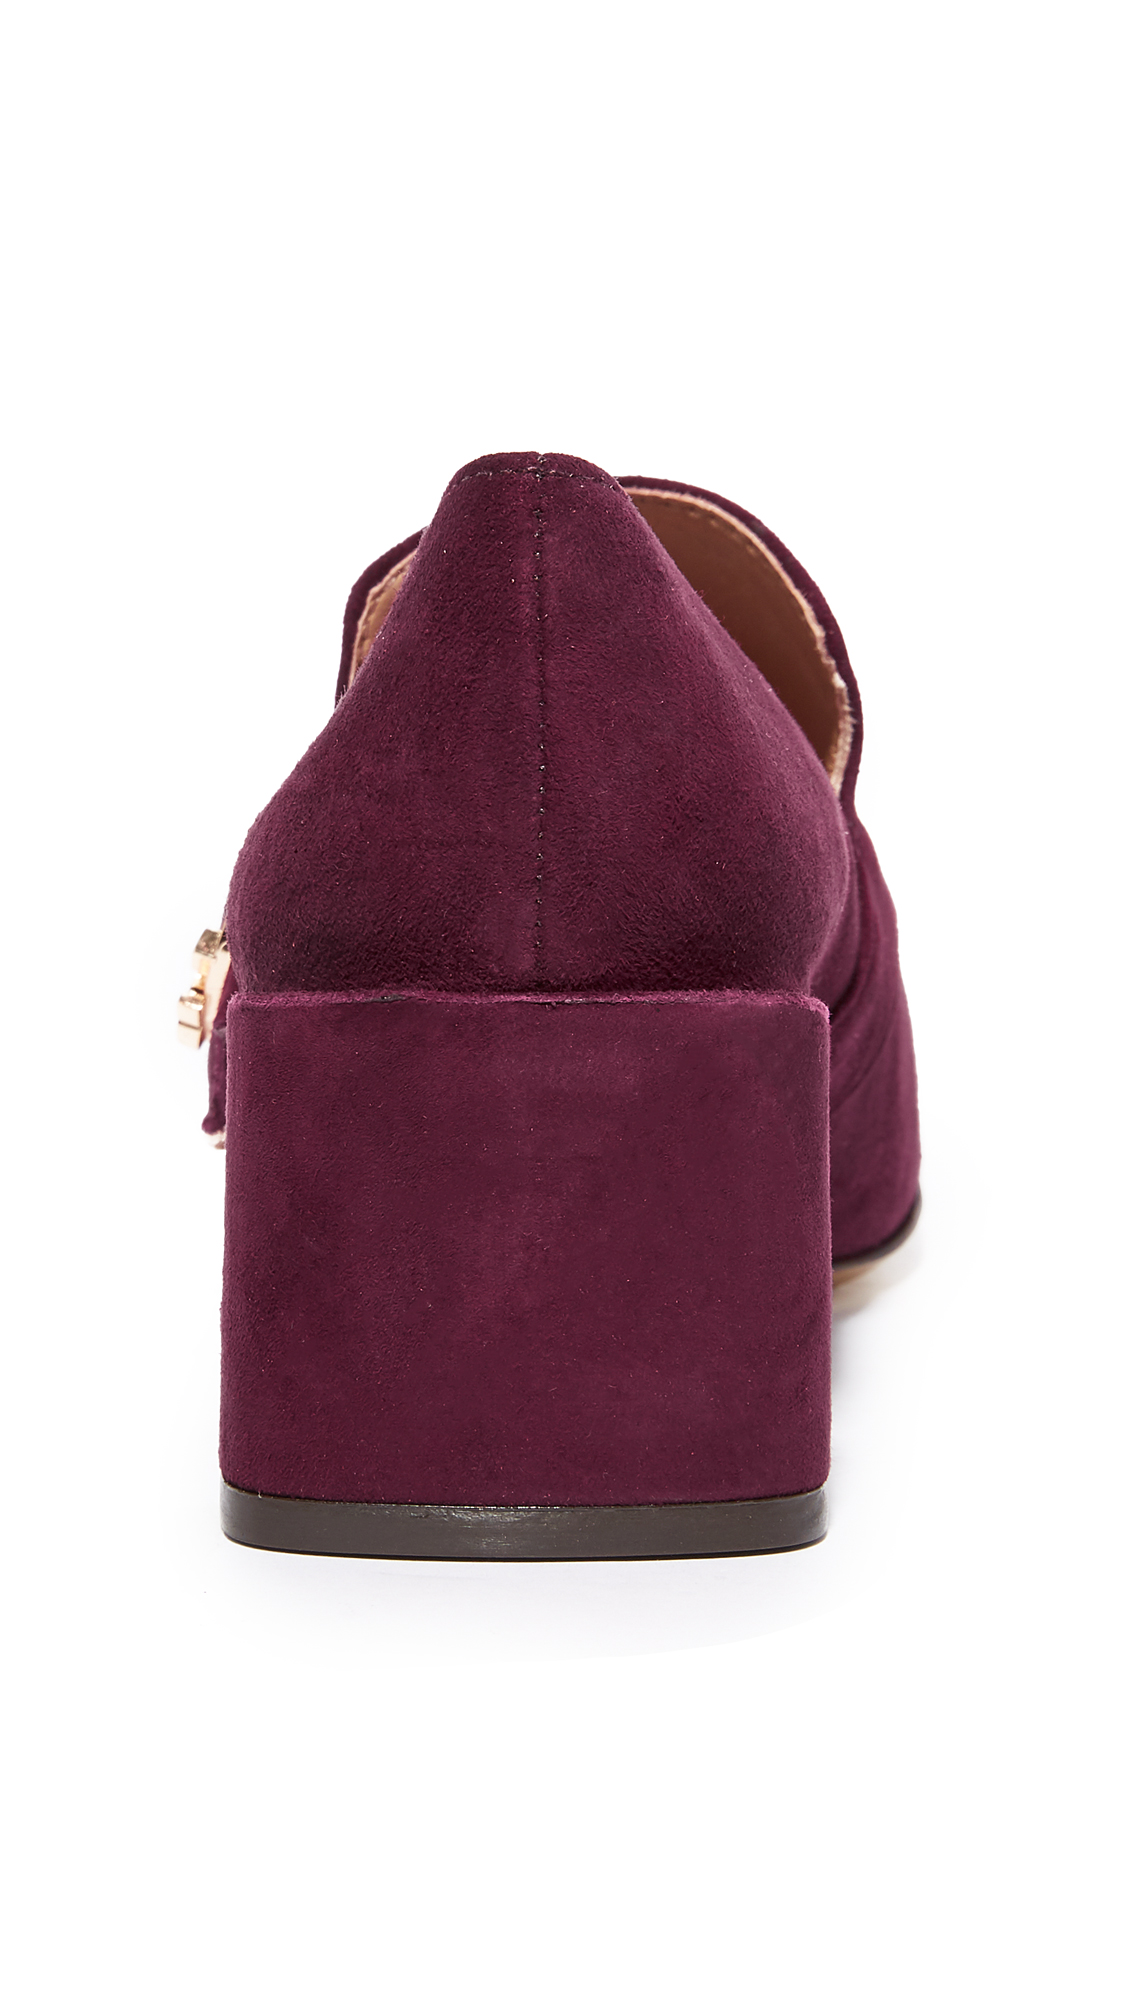 45aa059a499f Tory Burch Tess 50mm Loafers